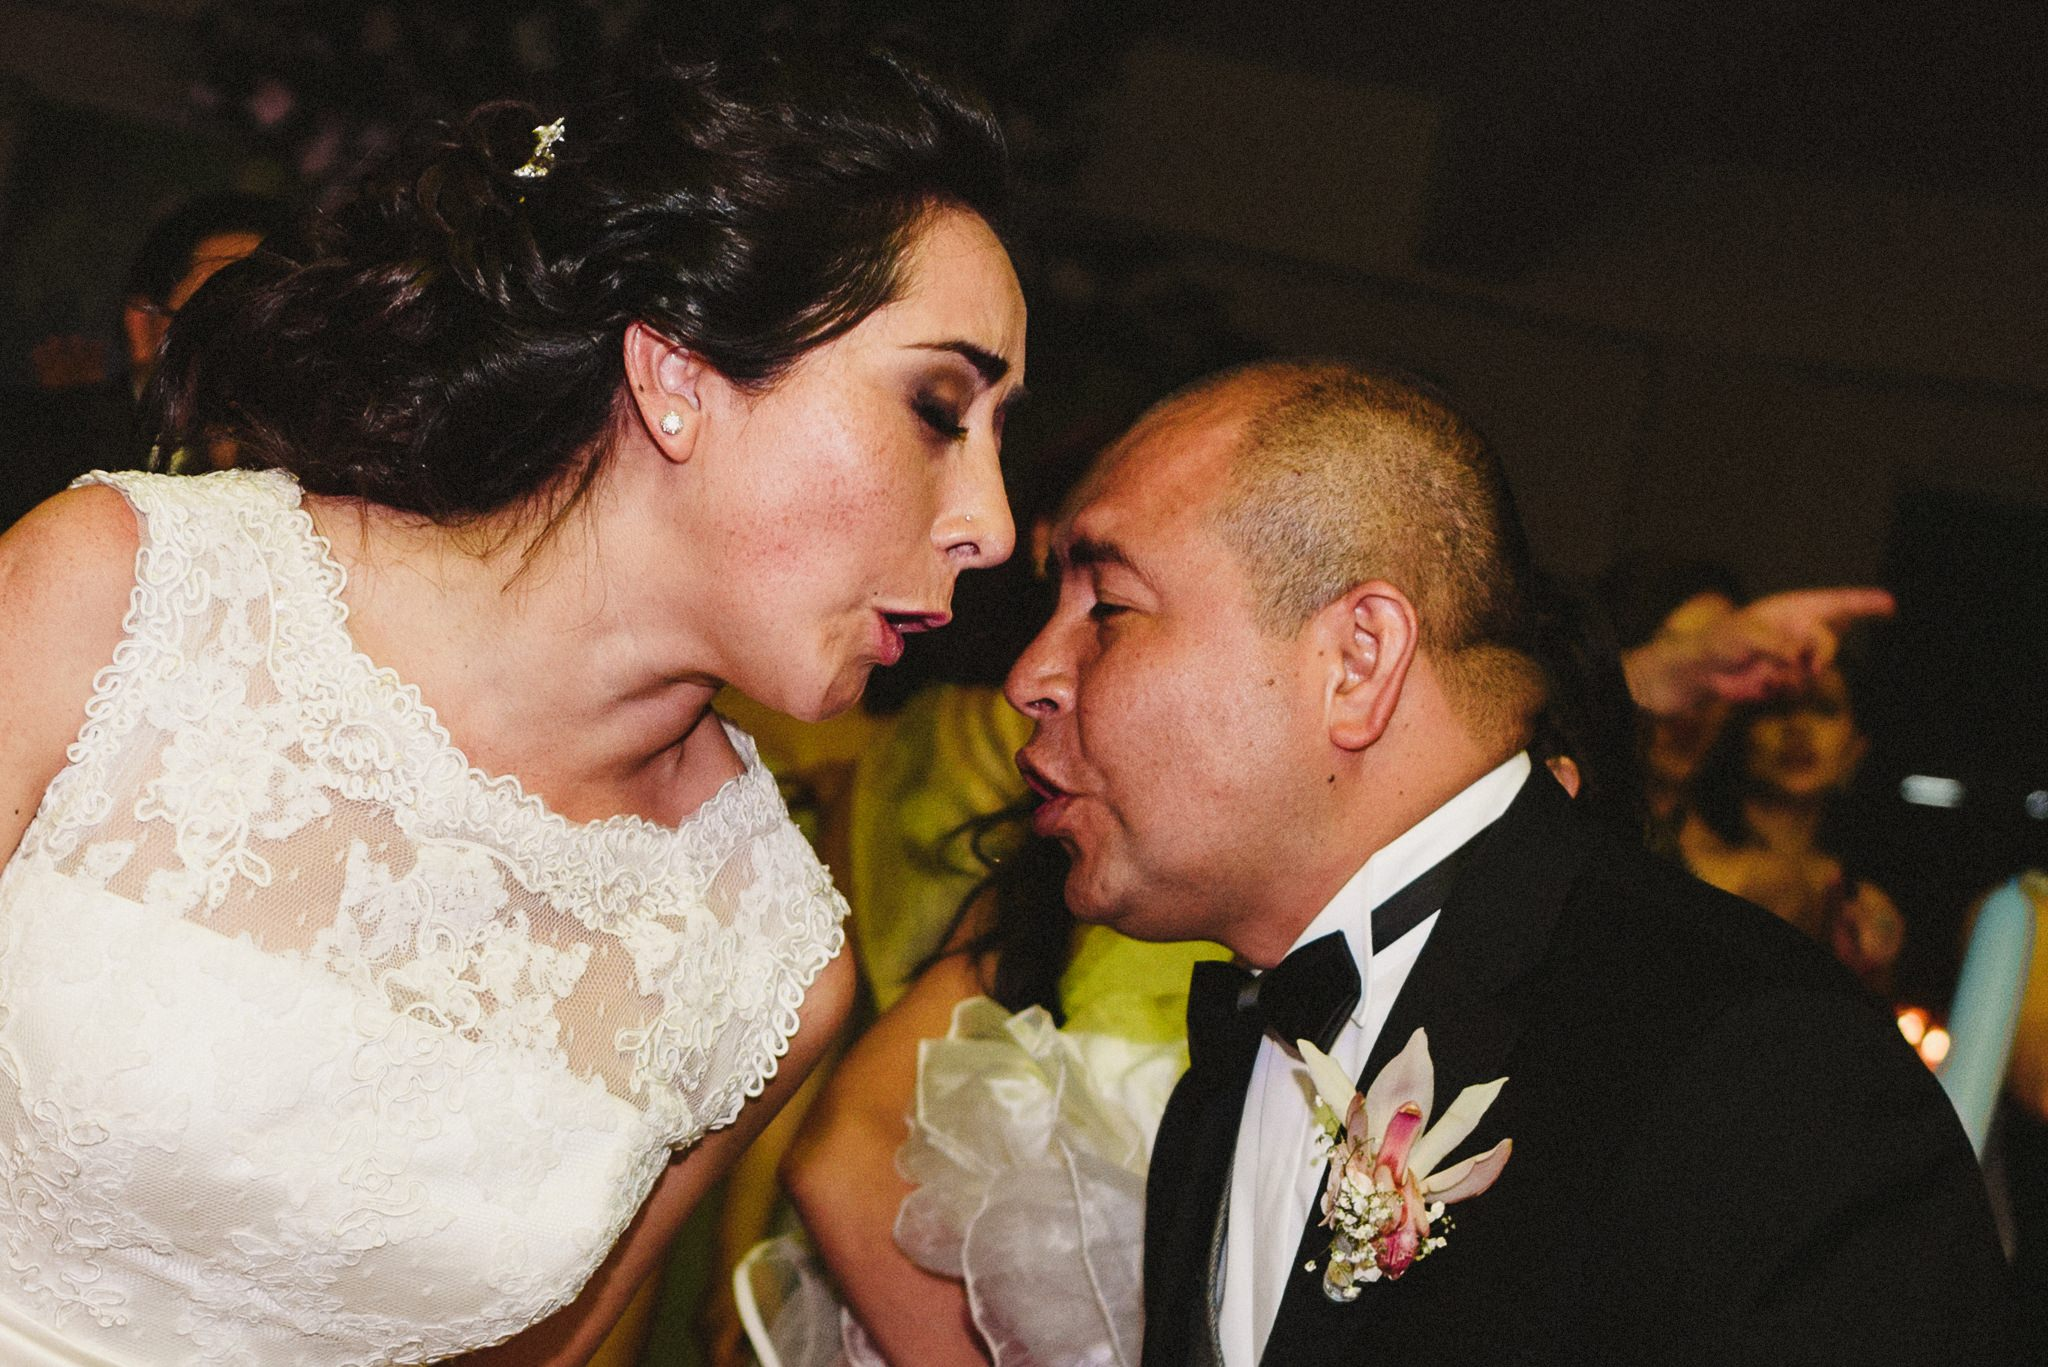 Wedding-Boda-Tulancingo-Hidalgo-Salon-Essenzia-Luis-Houdin-57-film